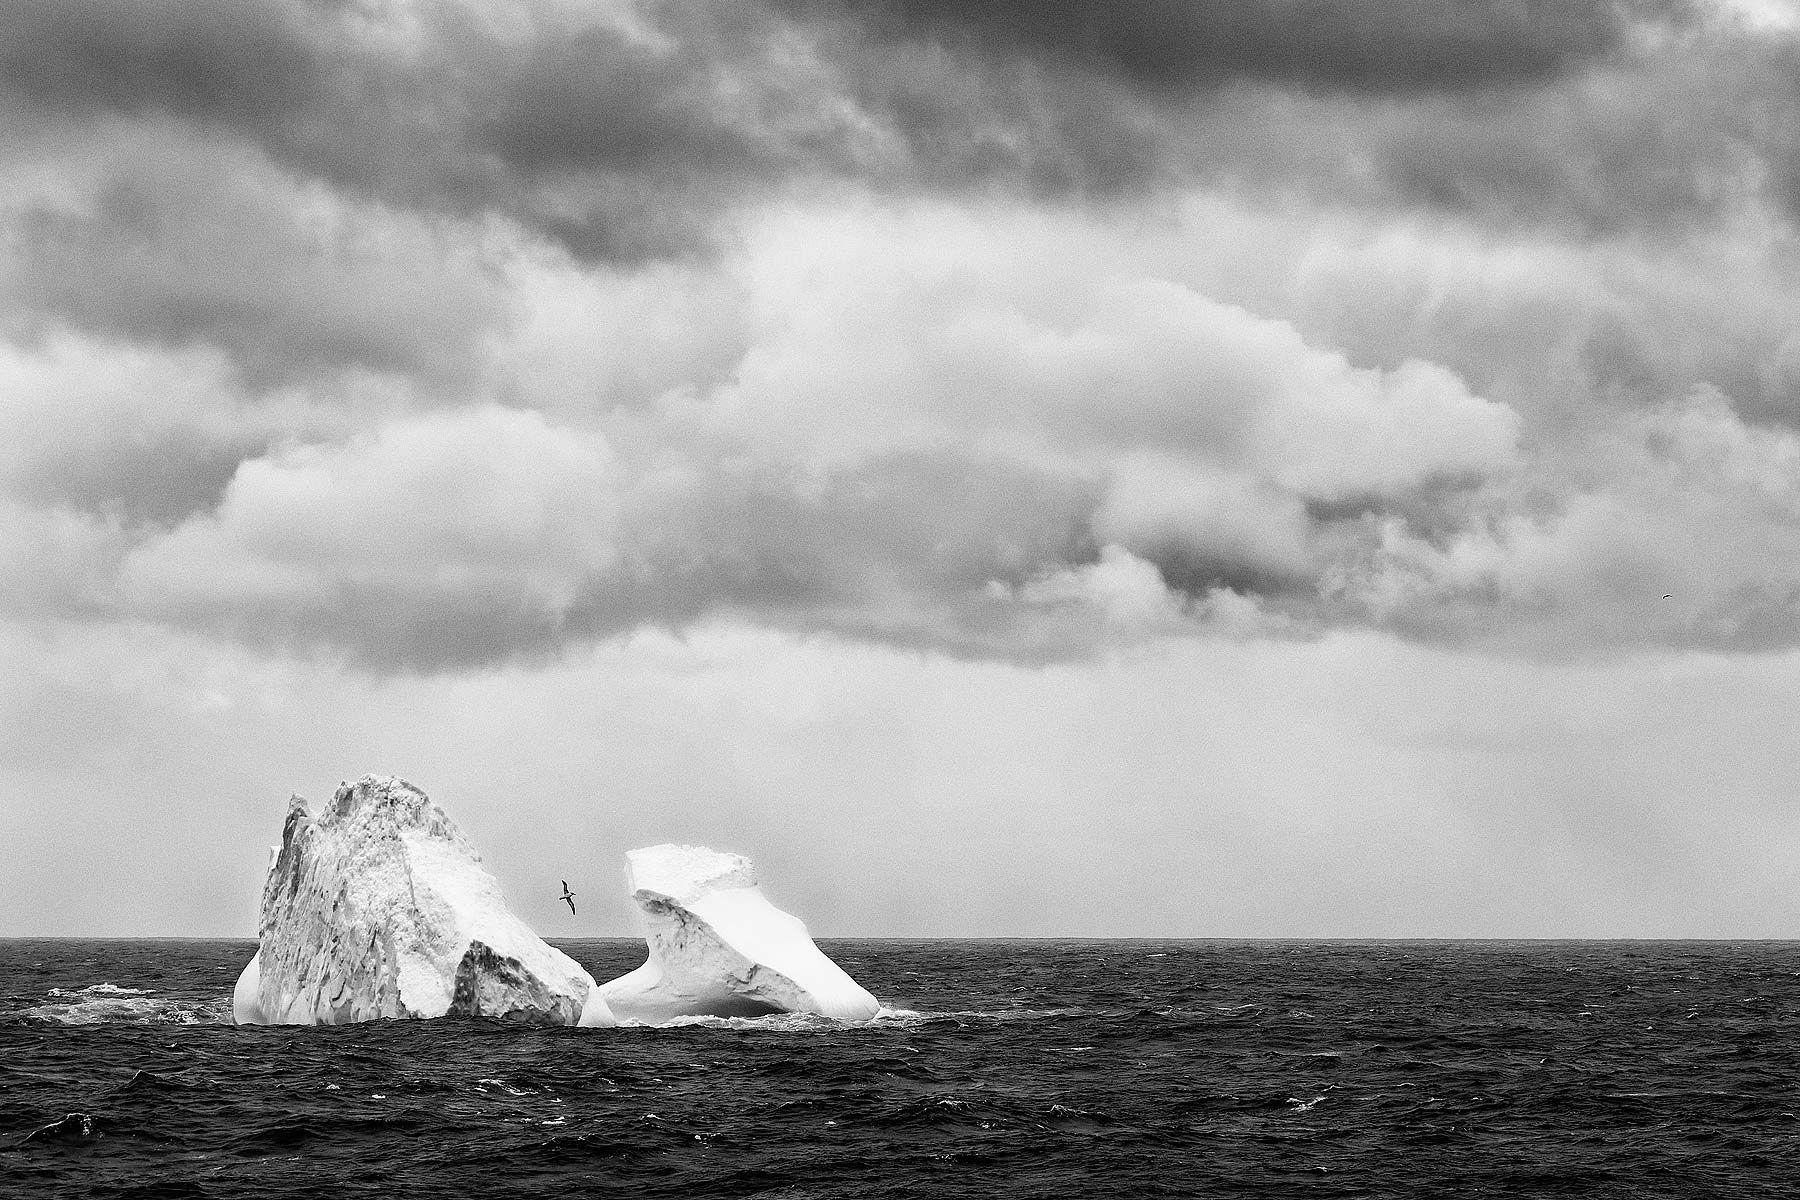 Iceberg-with-Grey-headed-albatross-flying_B&W_S6A1005-Bird-Island,-South-Georgia-Islands,-Southern-ocean.jpg